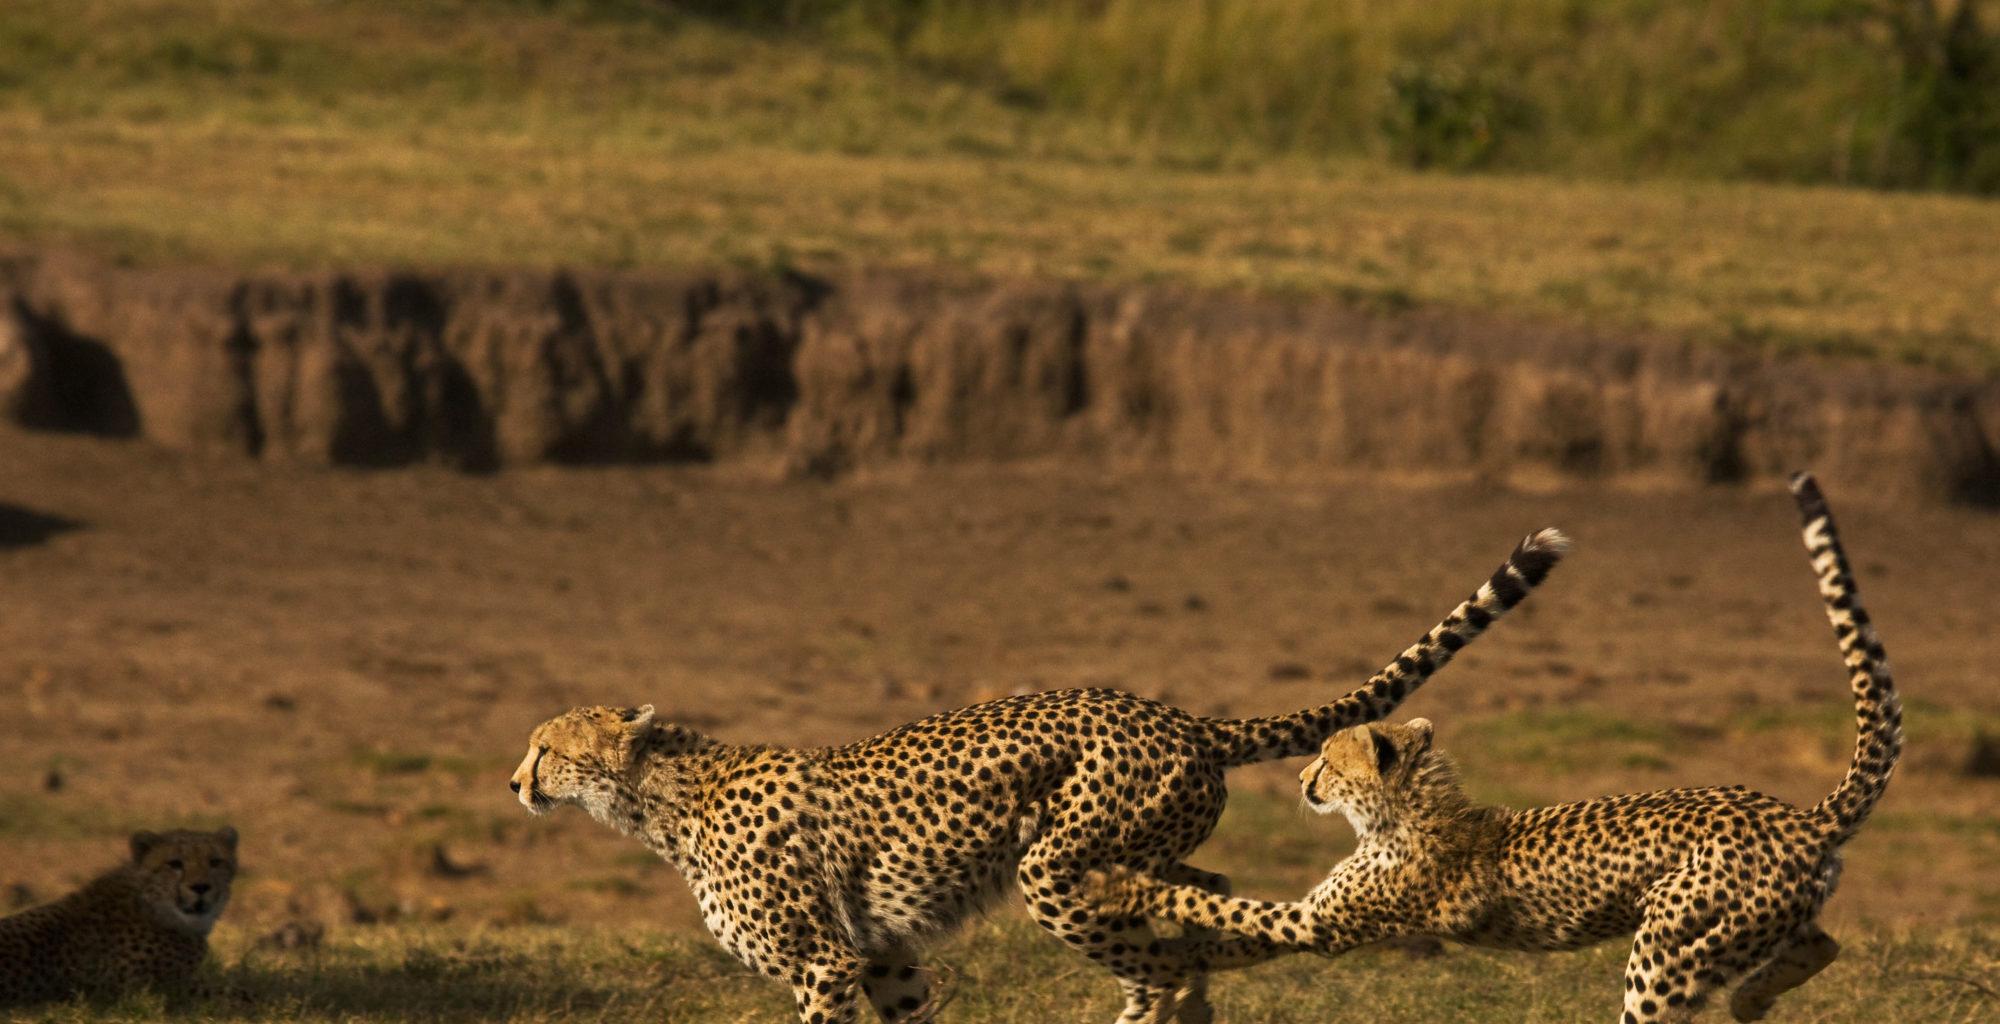 Mara Expedition Camp Wildlife Kenya